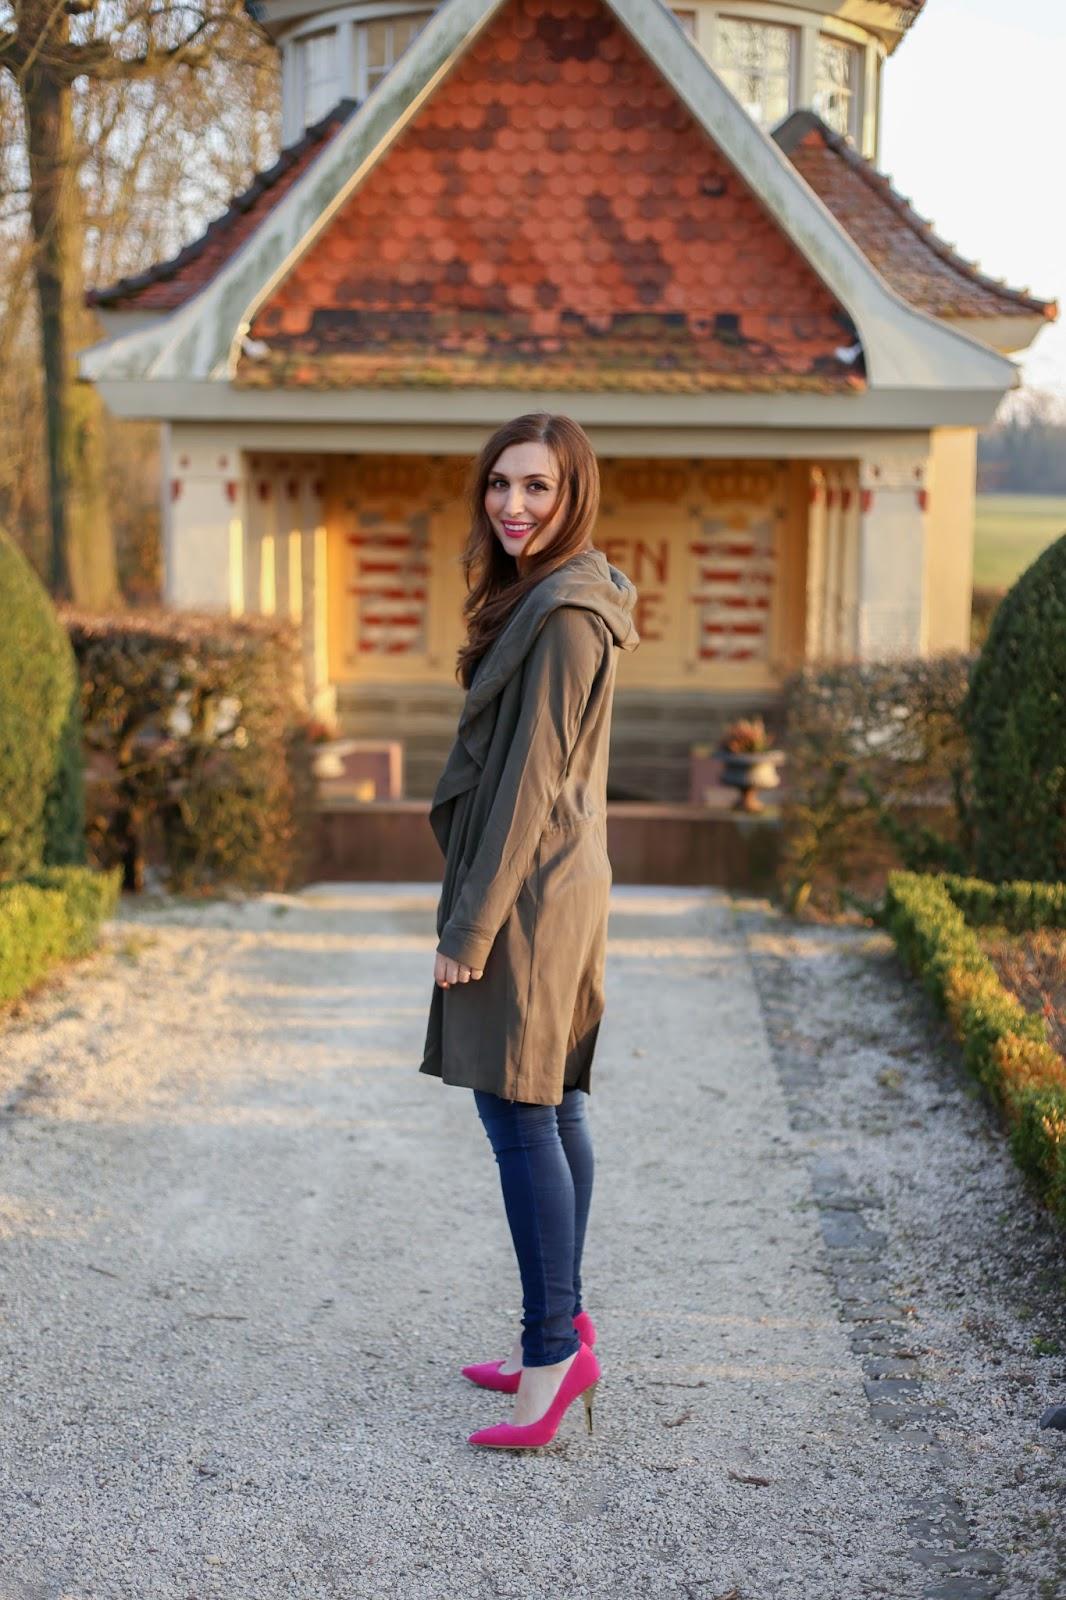 Fashionblogger aus Frankfurt - Frankfurt Blogger - Fashionstylebyjohanna - Khaki Mantel -Pinke Schuhe und Khaki Mantel - Bloggerstyle